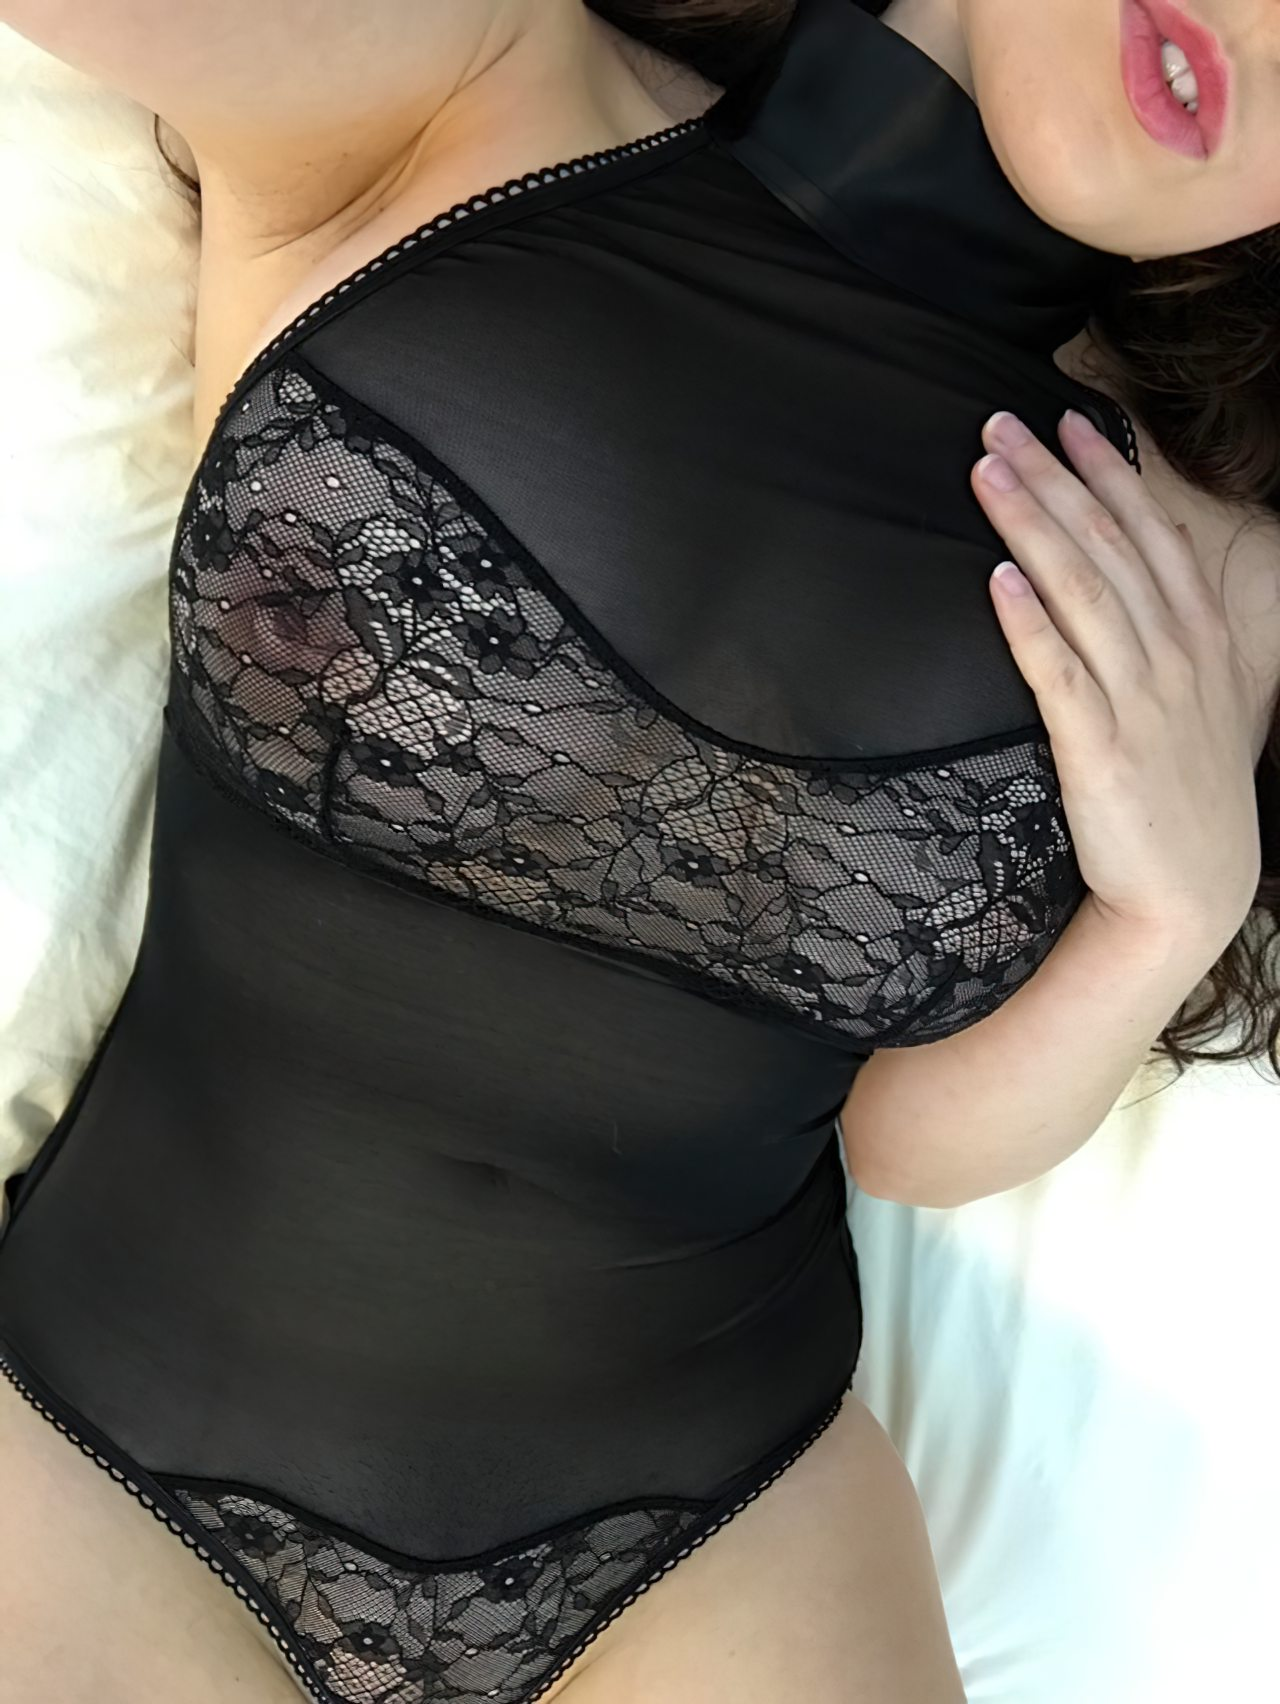 Amadora Roupinha Sexy (1)